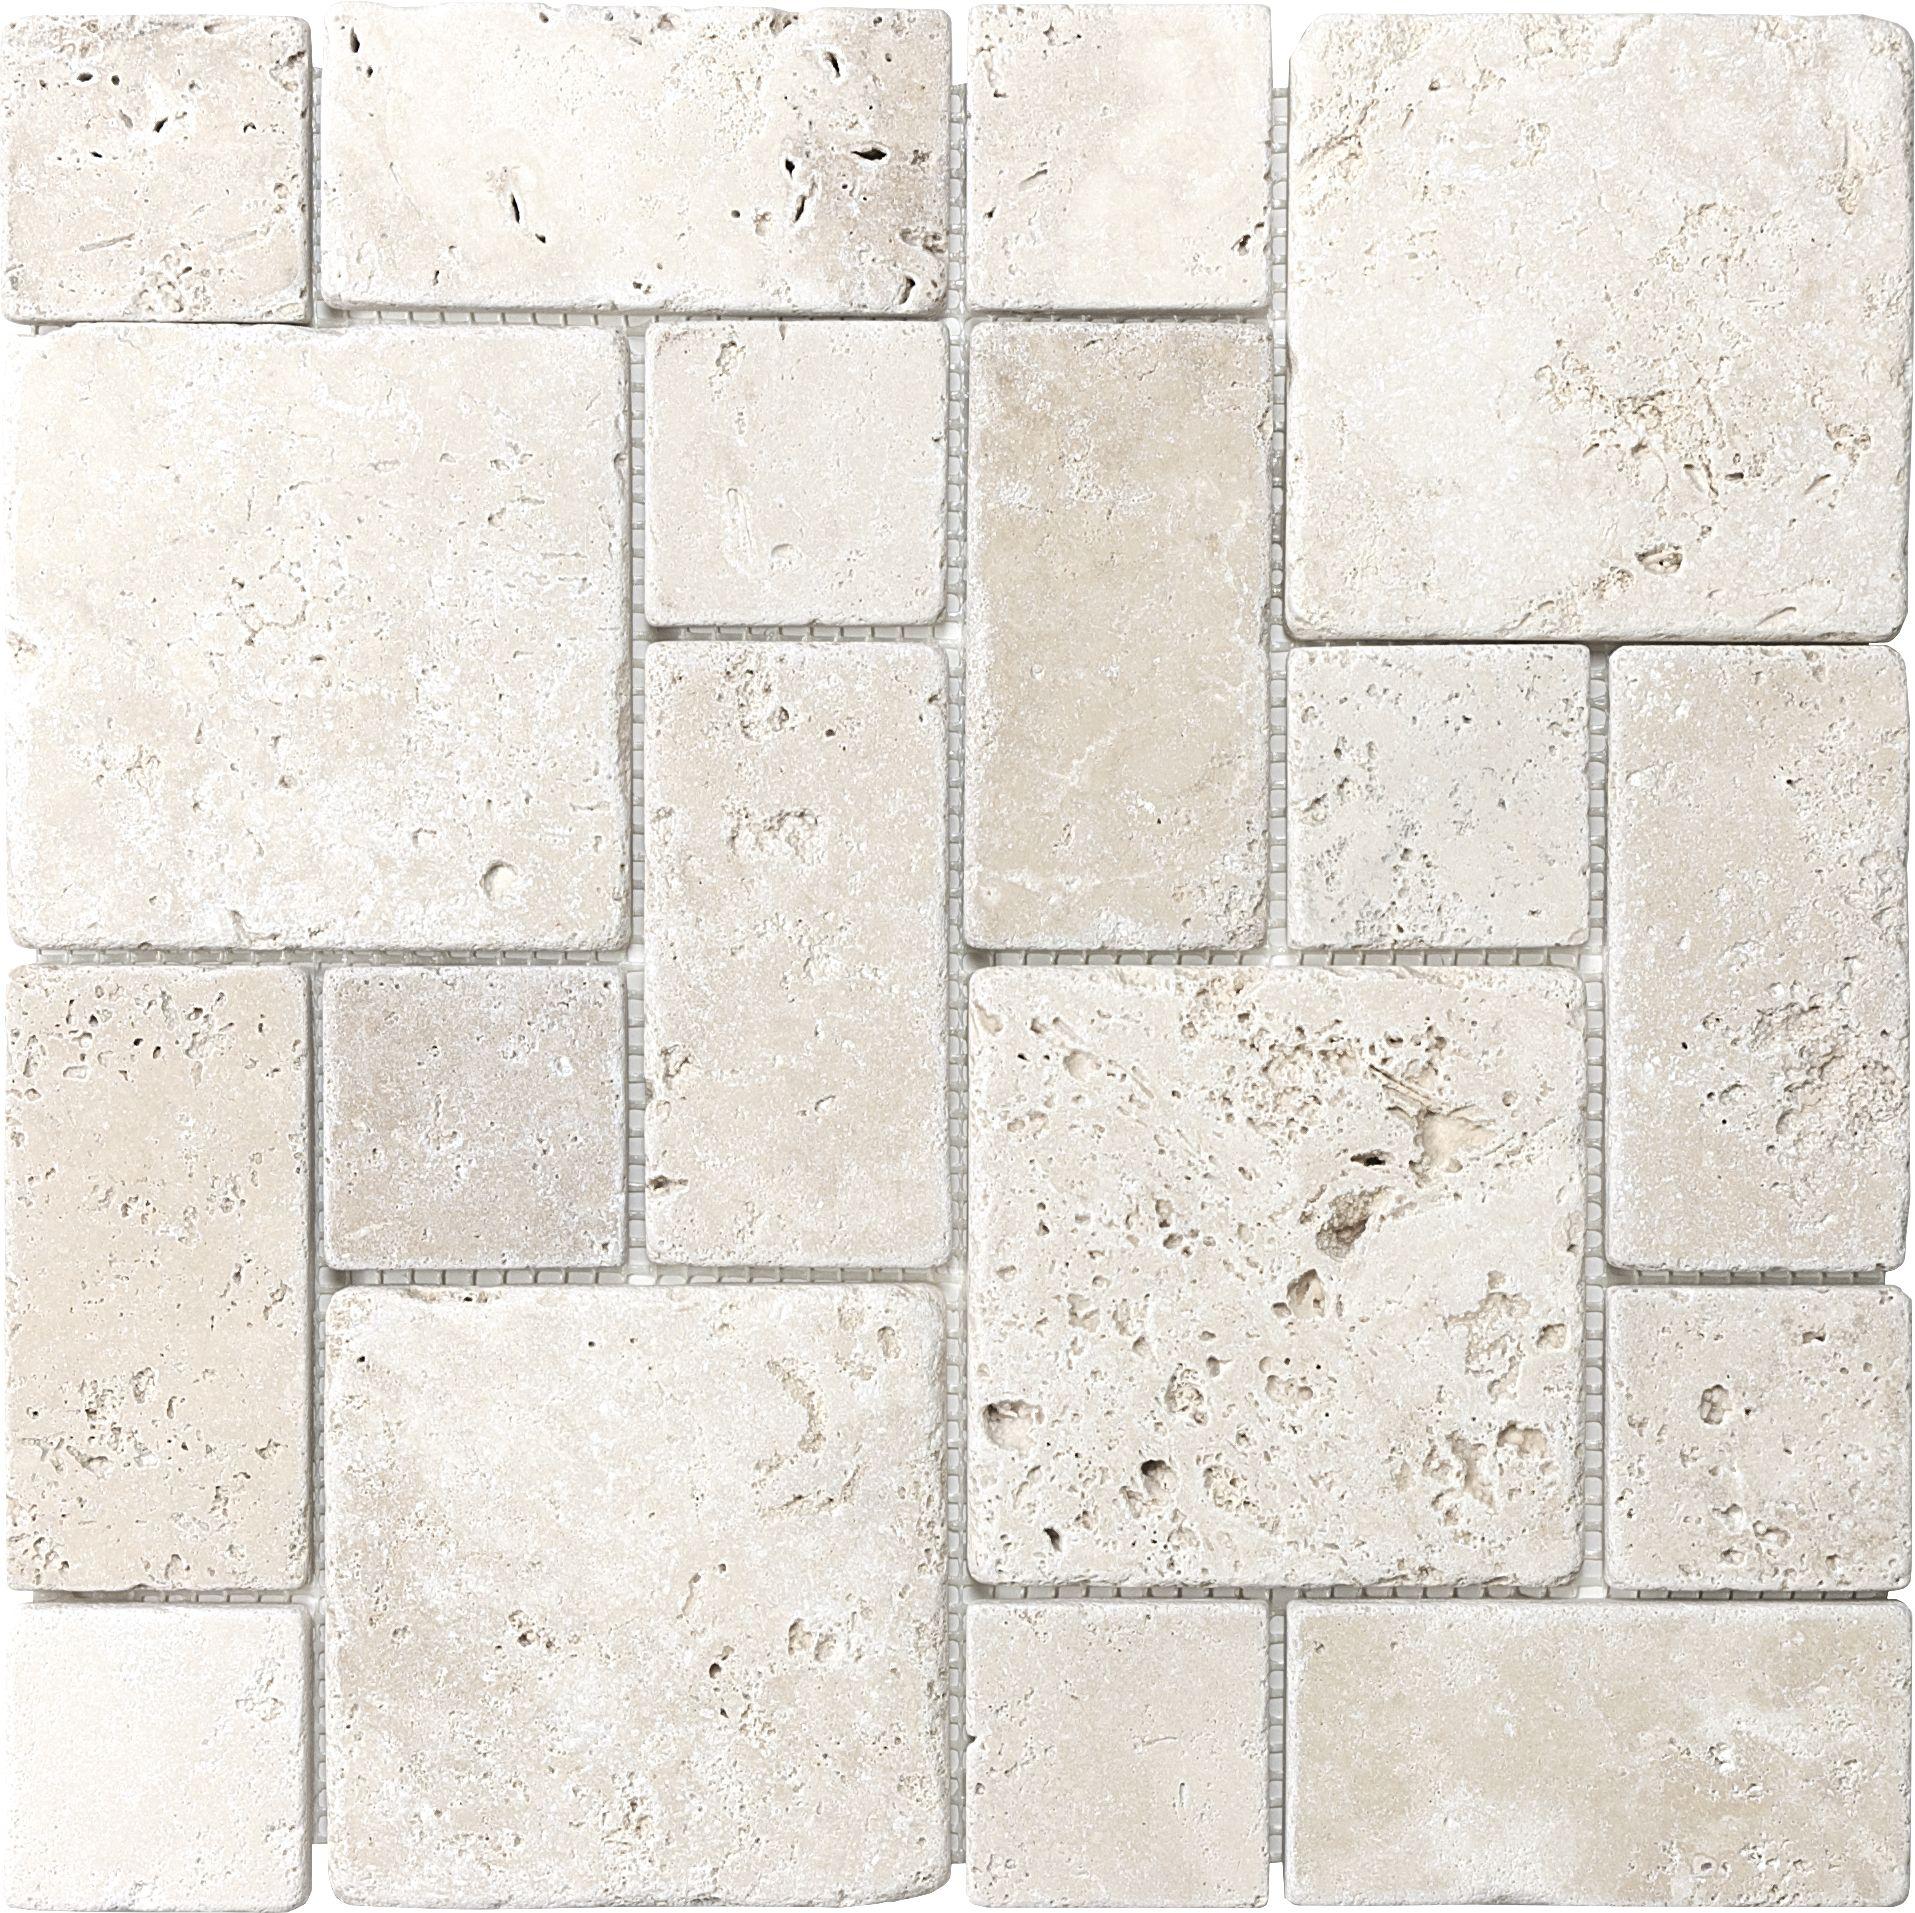 Chiaro Tile Backsplash: Anatolia Tile Chiaro Mixed Pattern Mosaic Travertine Wall